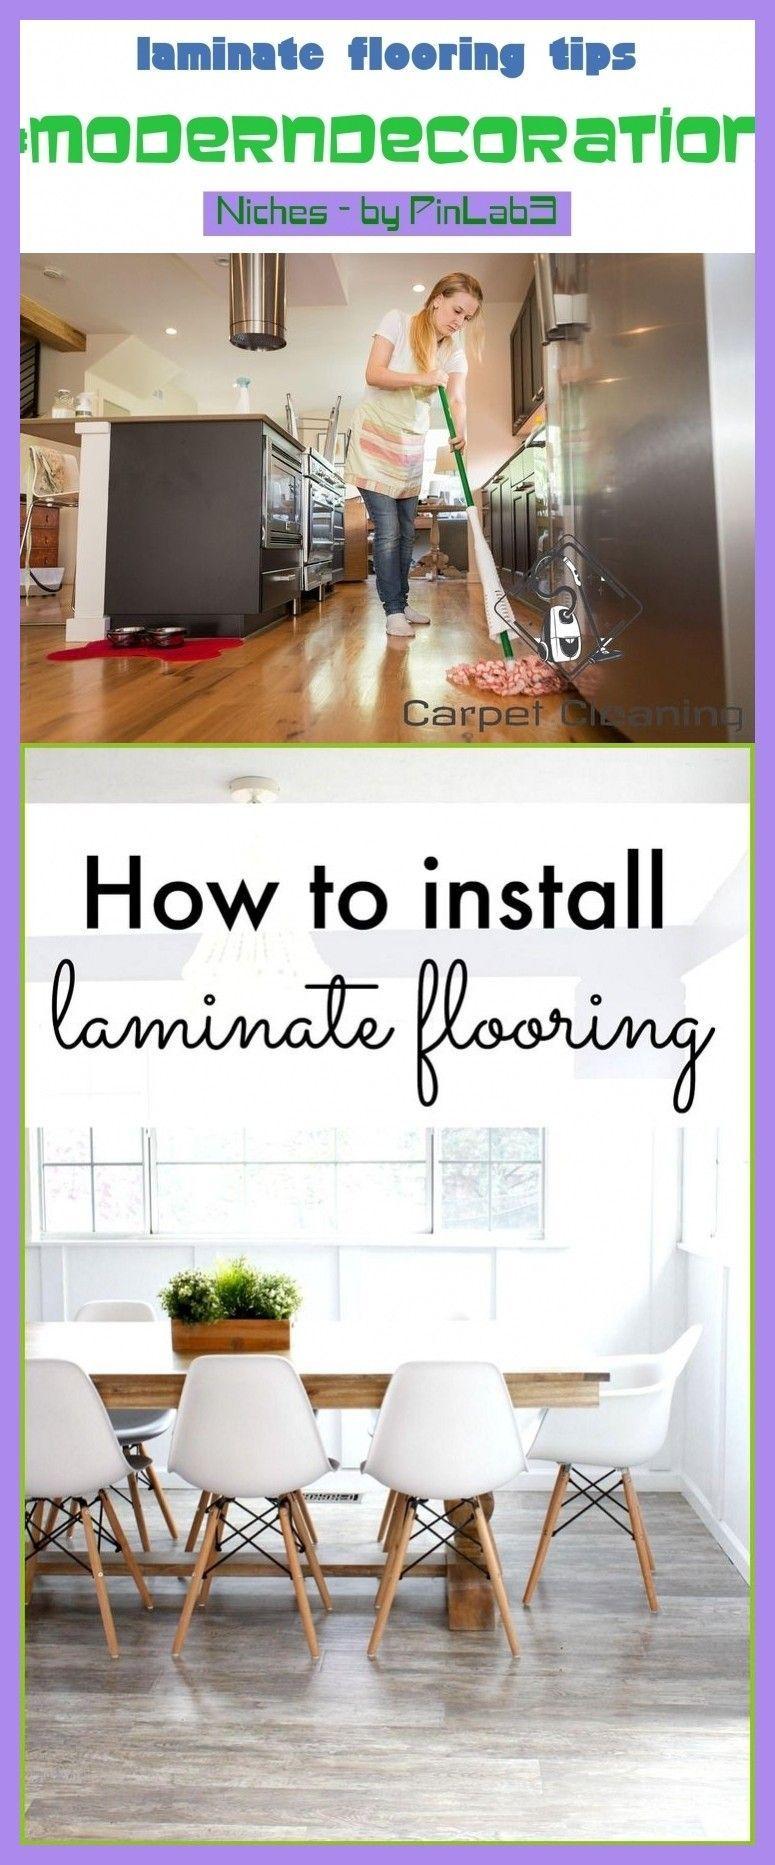 Laminate flooring tips #moderndecoration #home. laminate ...